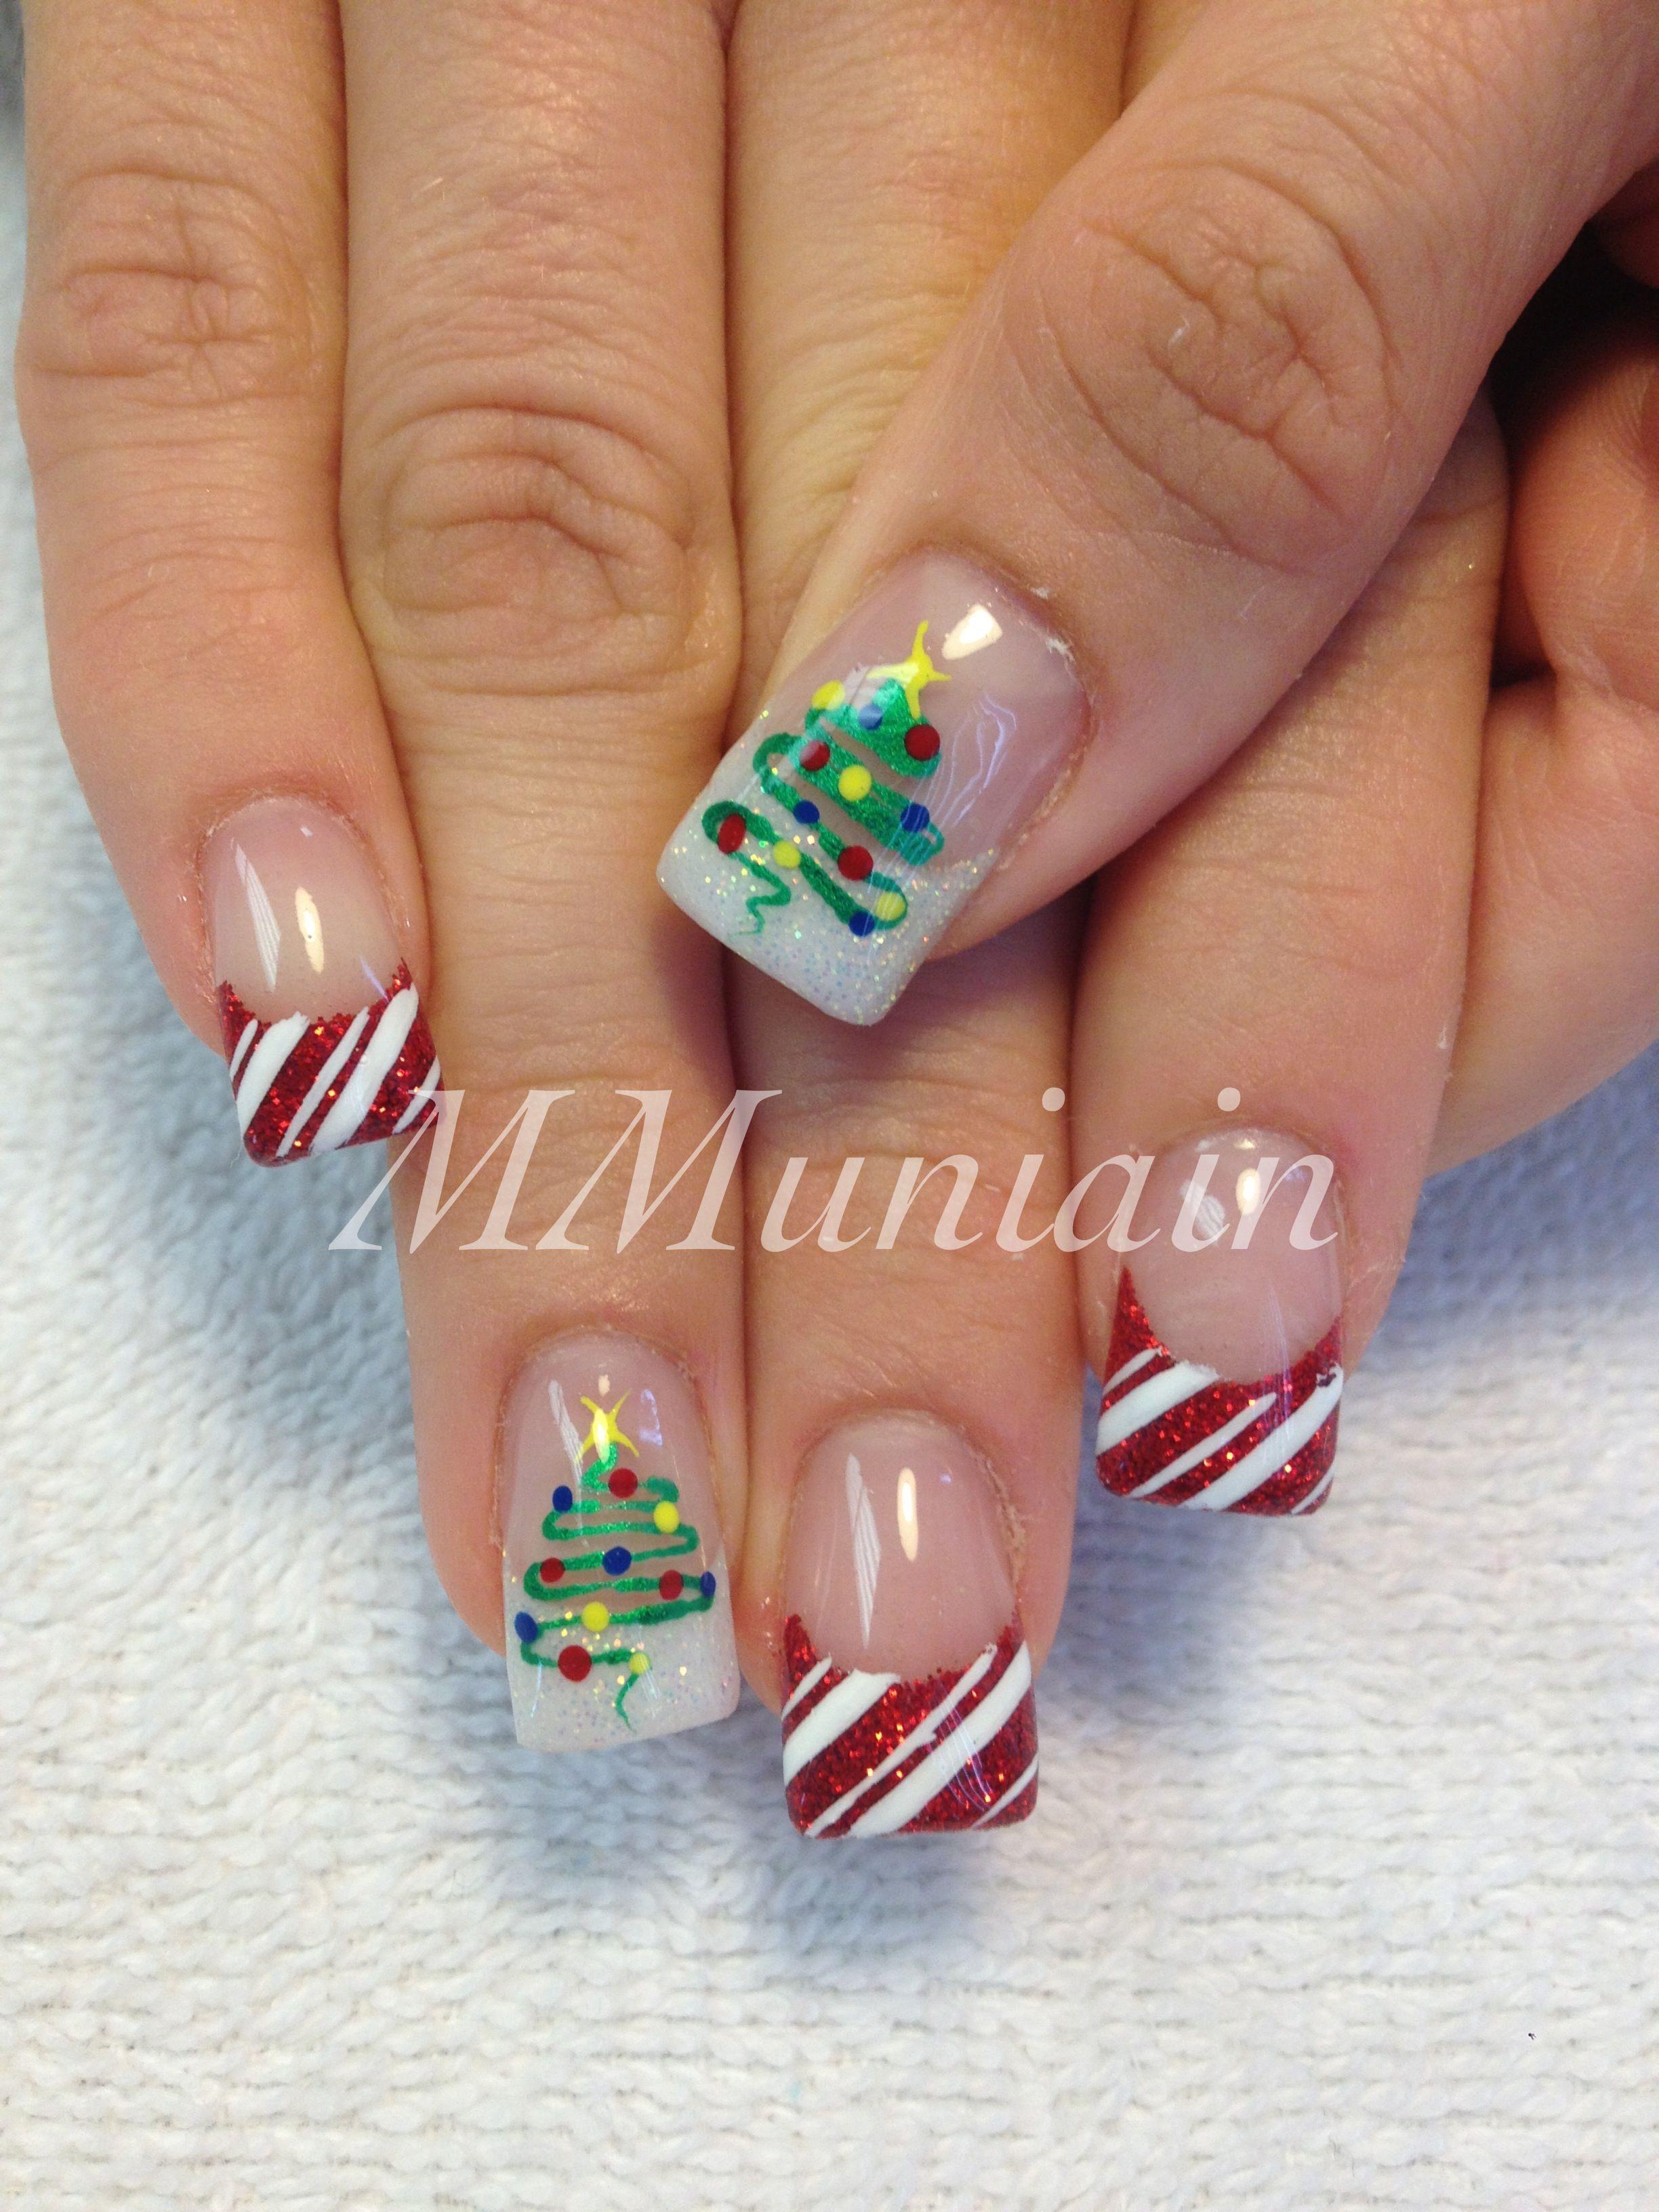 Trendingdress Com Bringing You The Latest Fashion Trends Christmas Nails Xmas Nails Candy Cane Nails